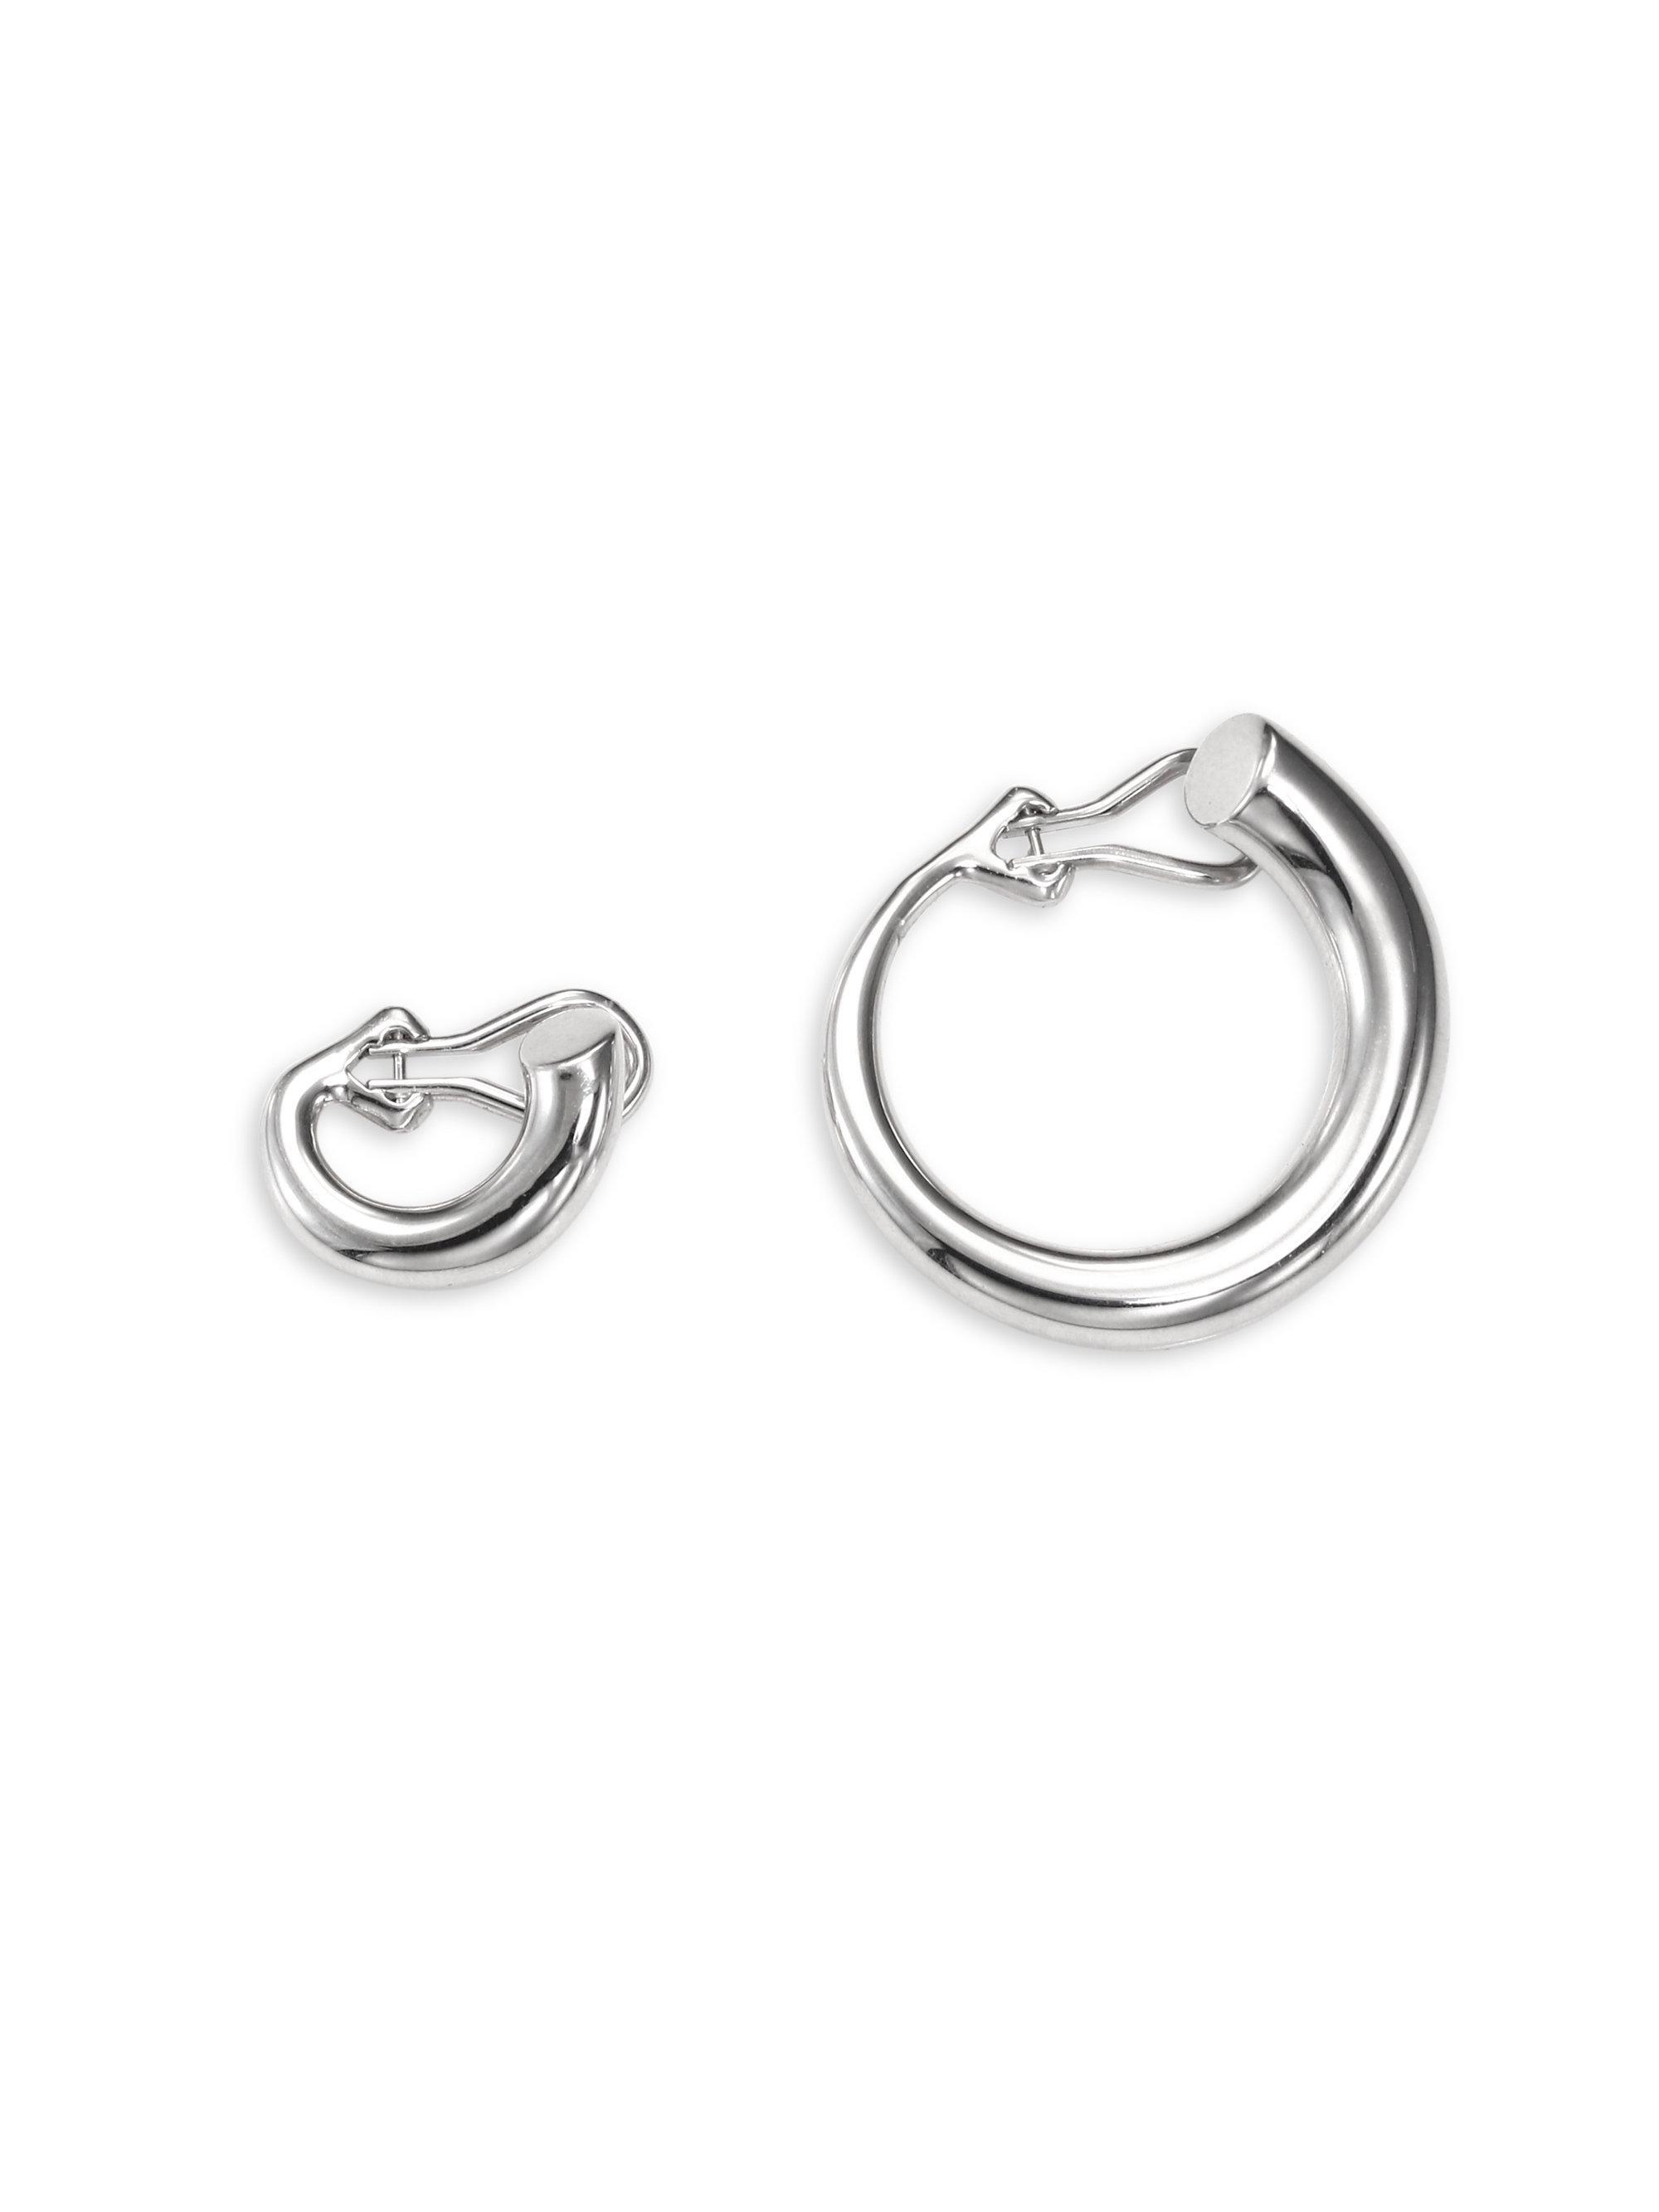 6b952ce31 Charlotte Chesnais Monie Small & Medium Sterling Silver Clip-on ...